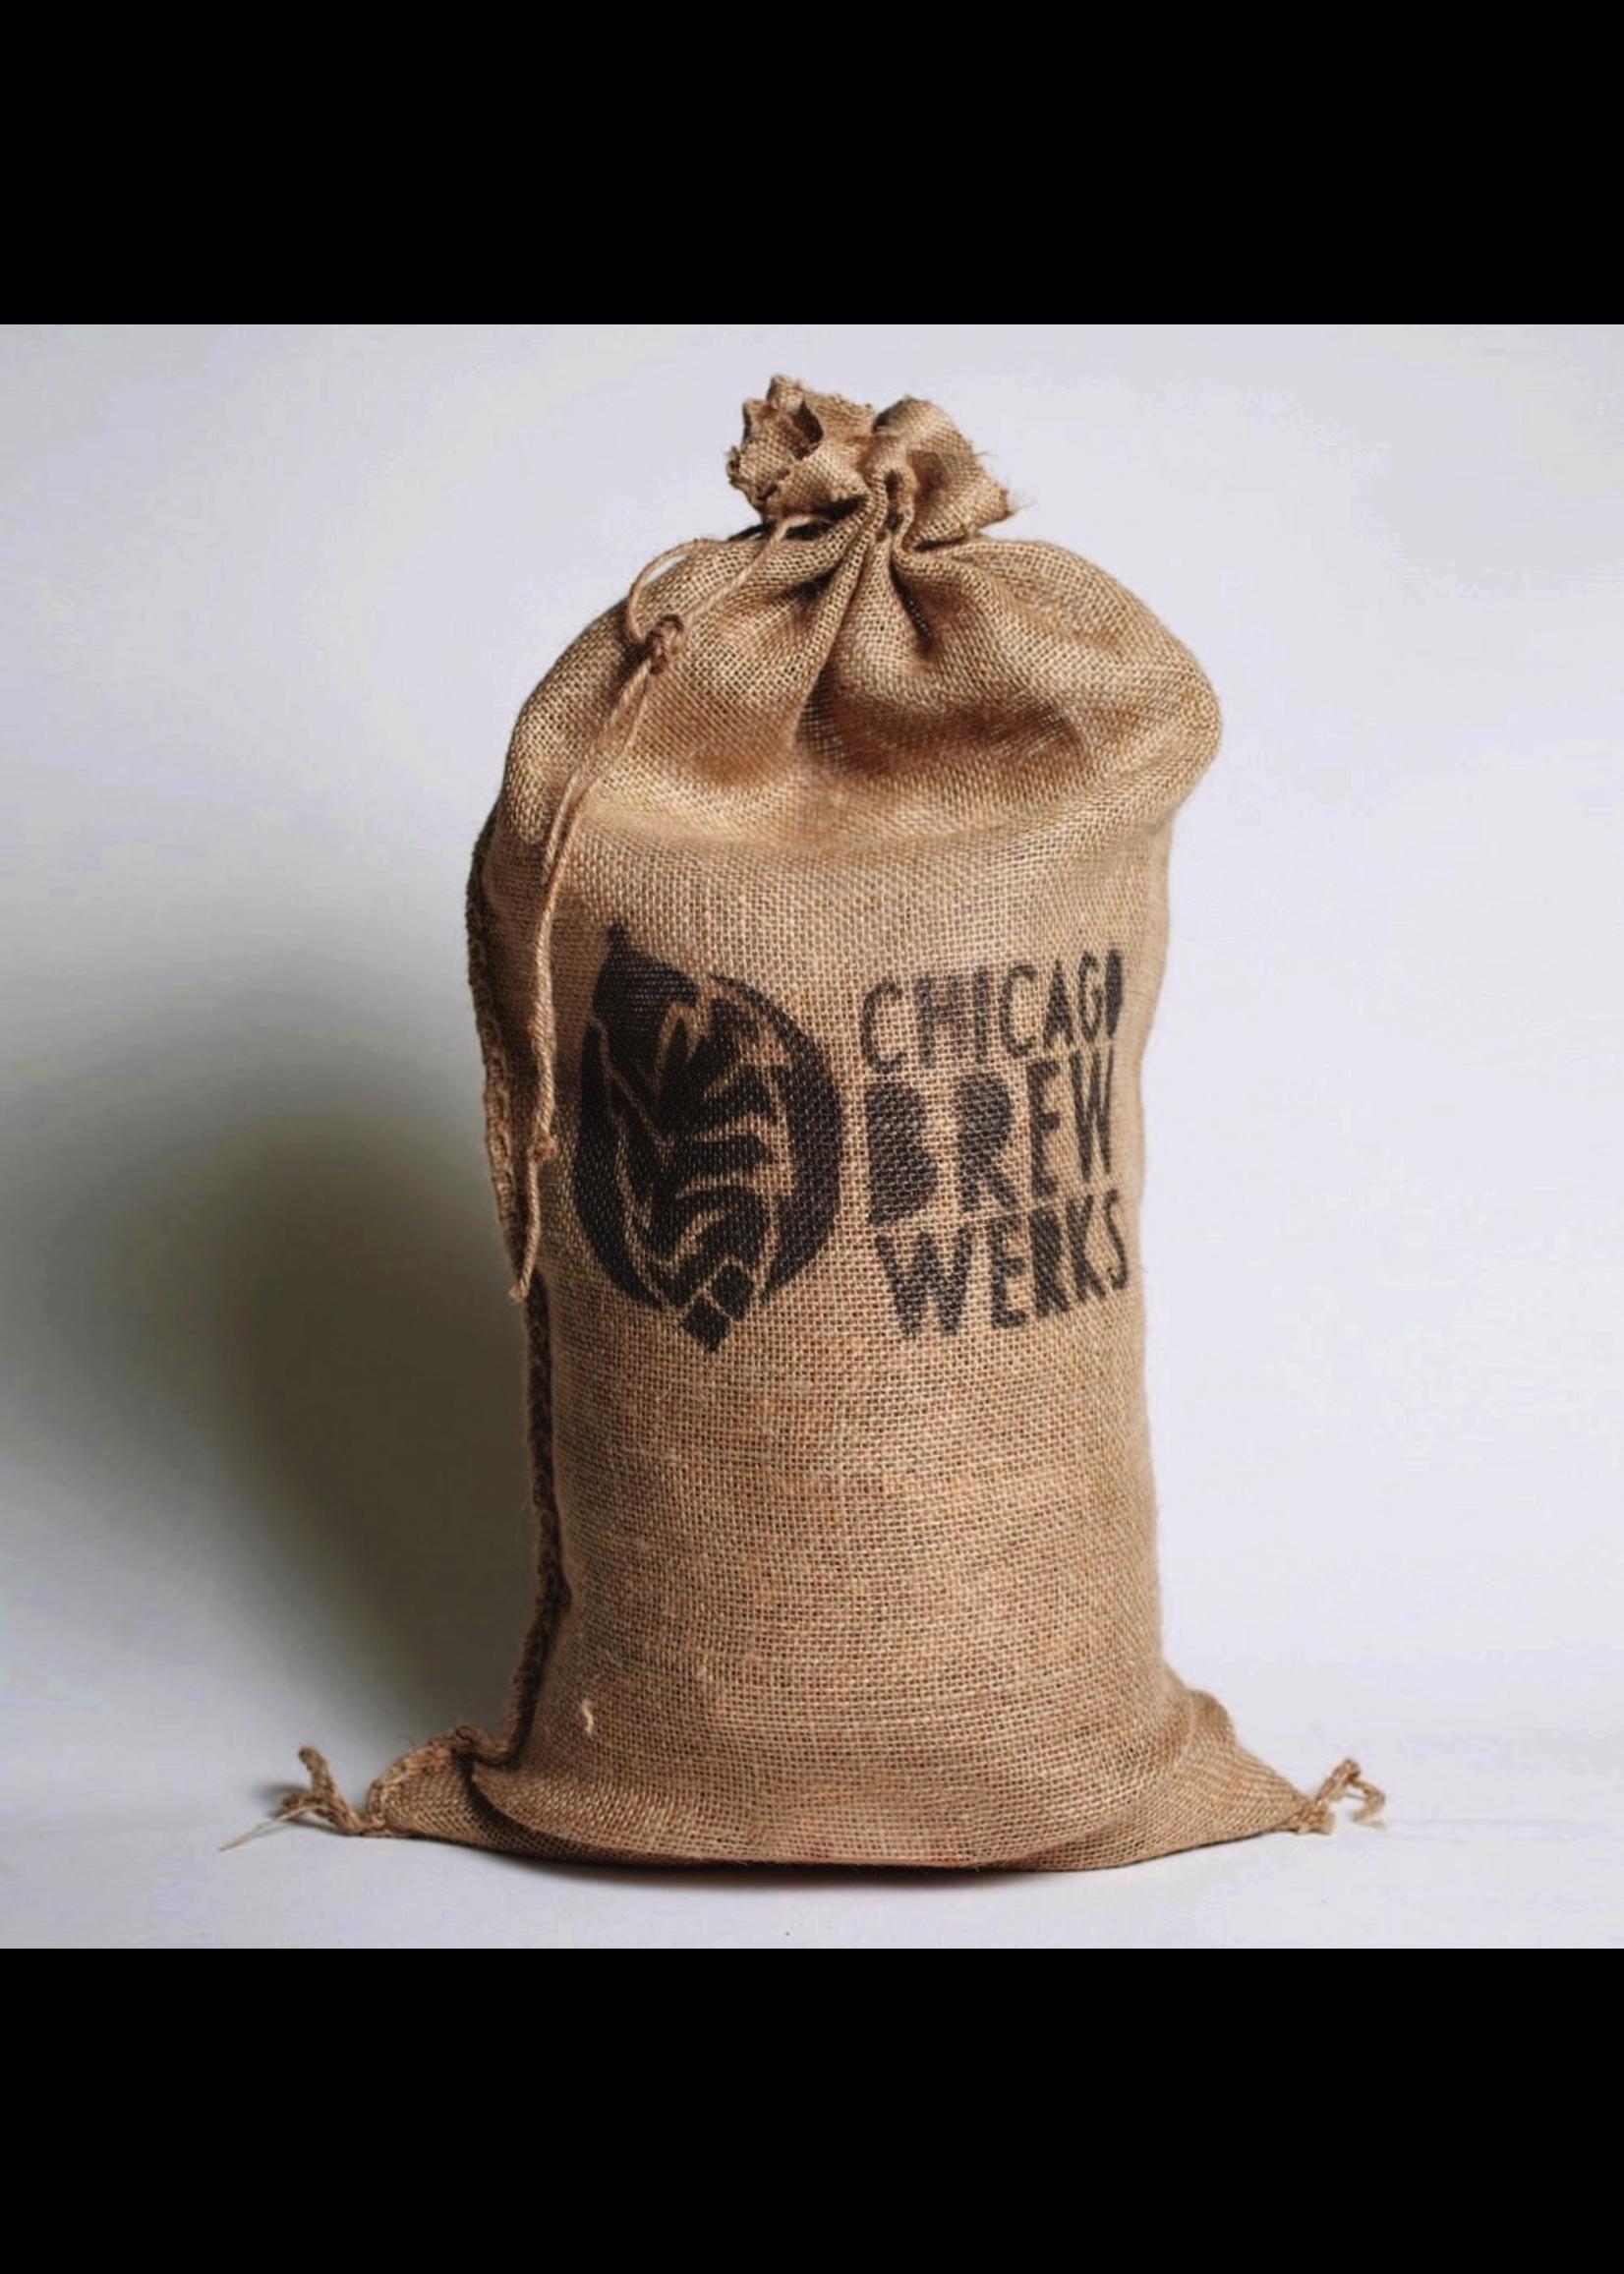 Ingredient Kits CBW Moth Kidz - 5 Gallon All Grain Kit